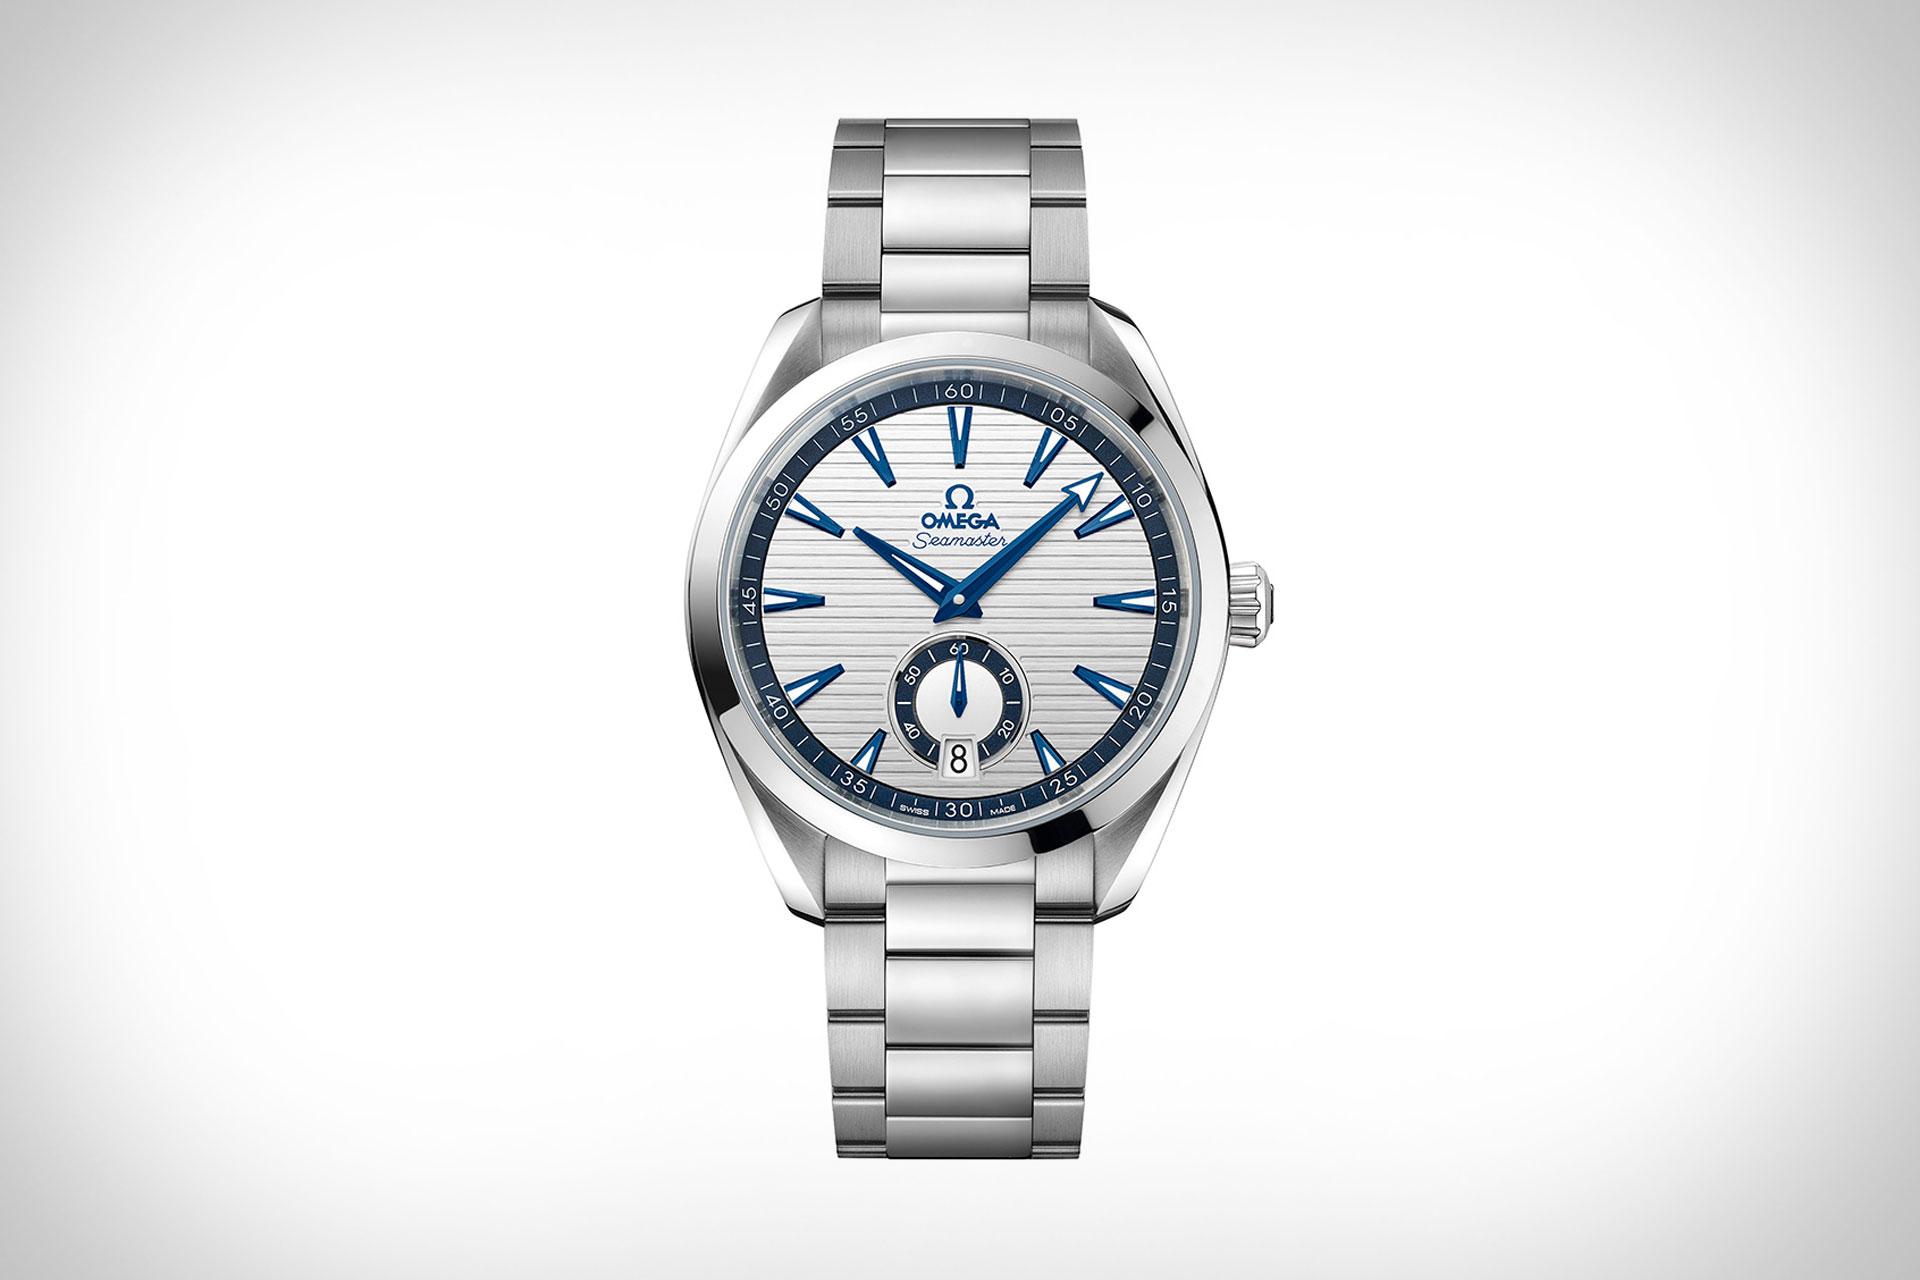 2021 Omega Seamster Aqua Terra Watch Collection